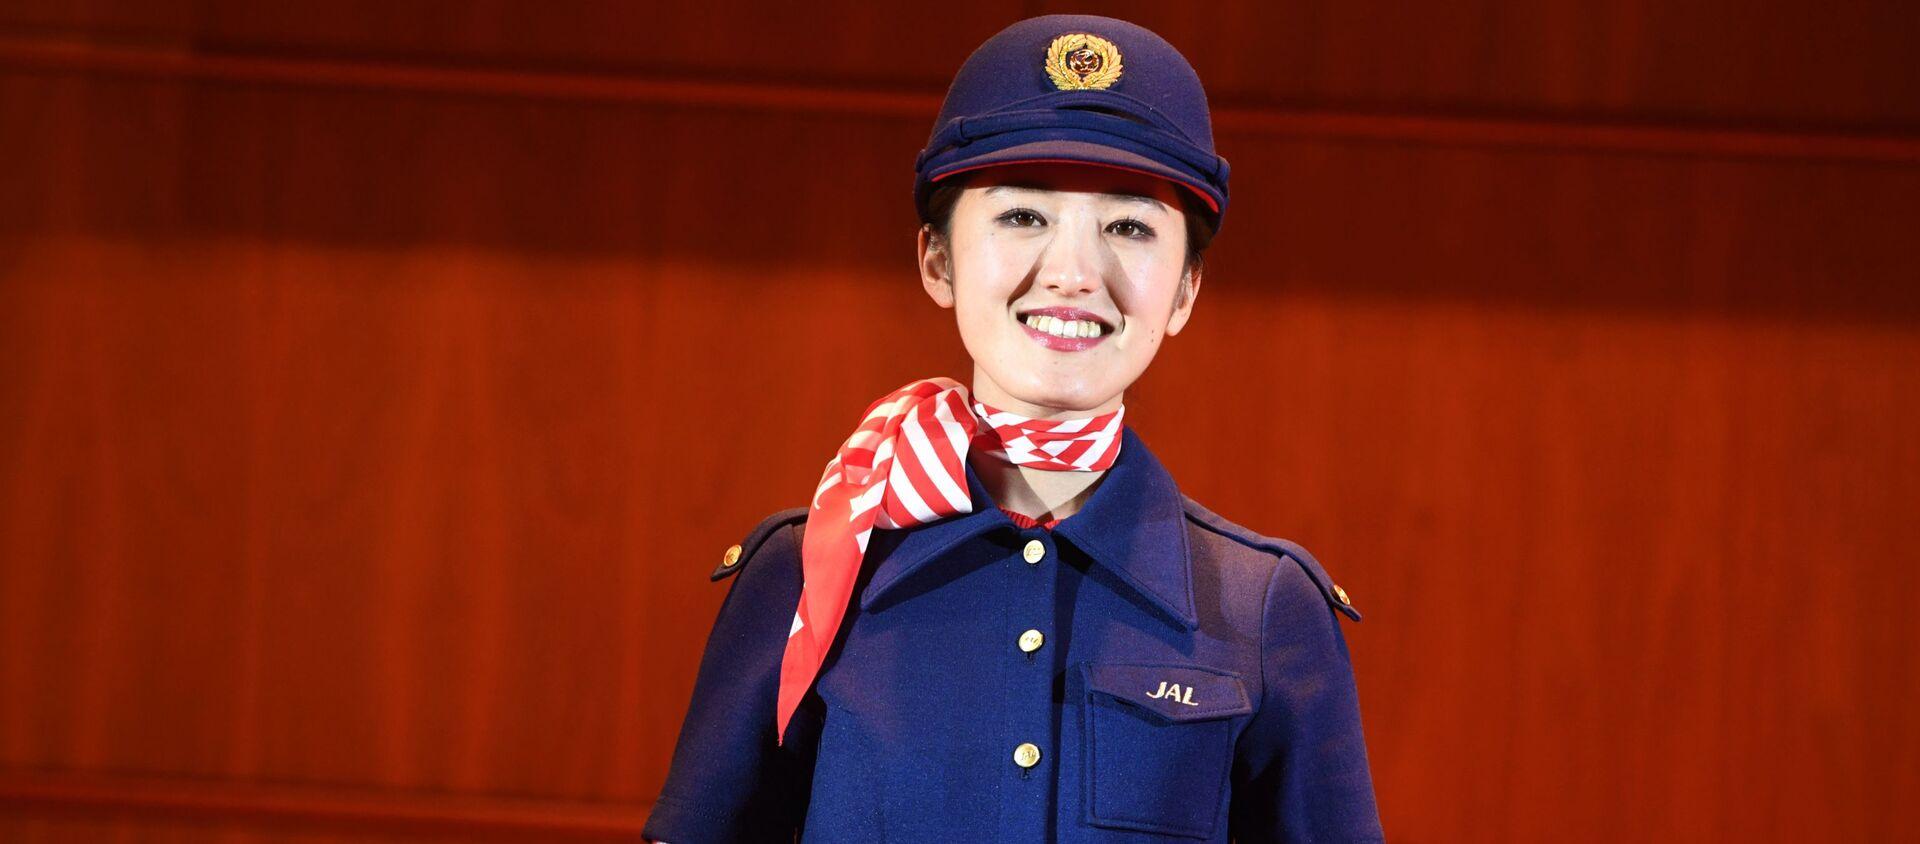 Una hostess di Japan Airlines - Sputnik Italia, 1920, 29.09.2020